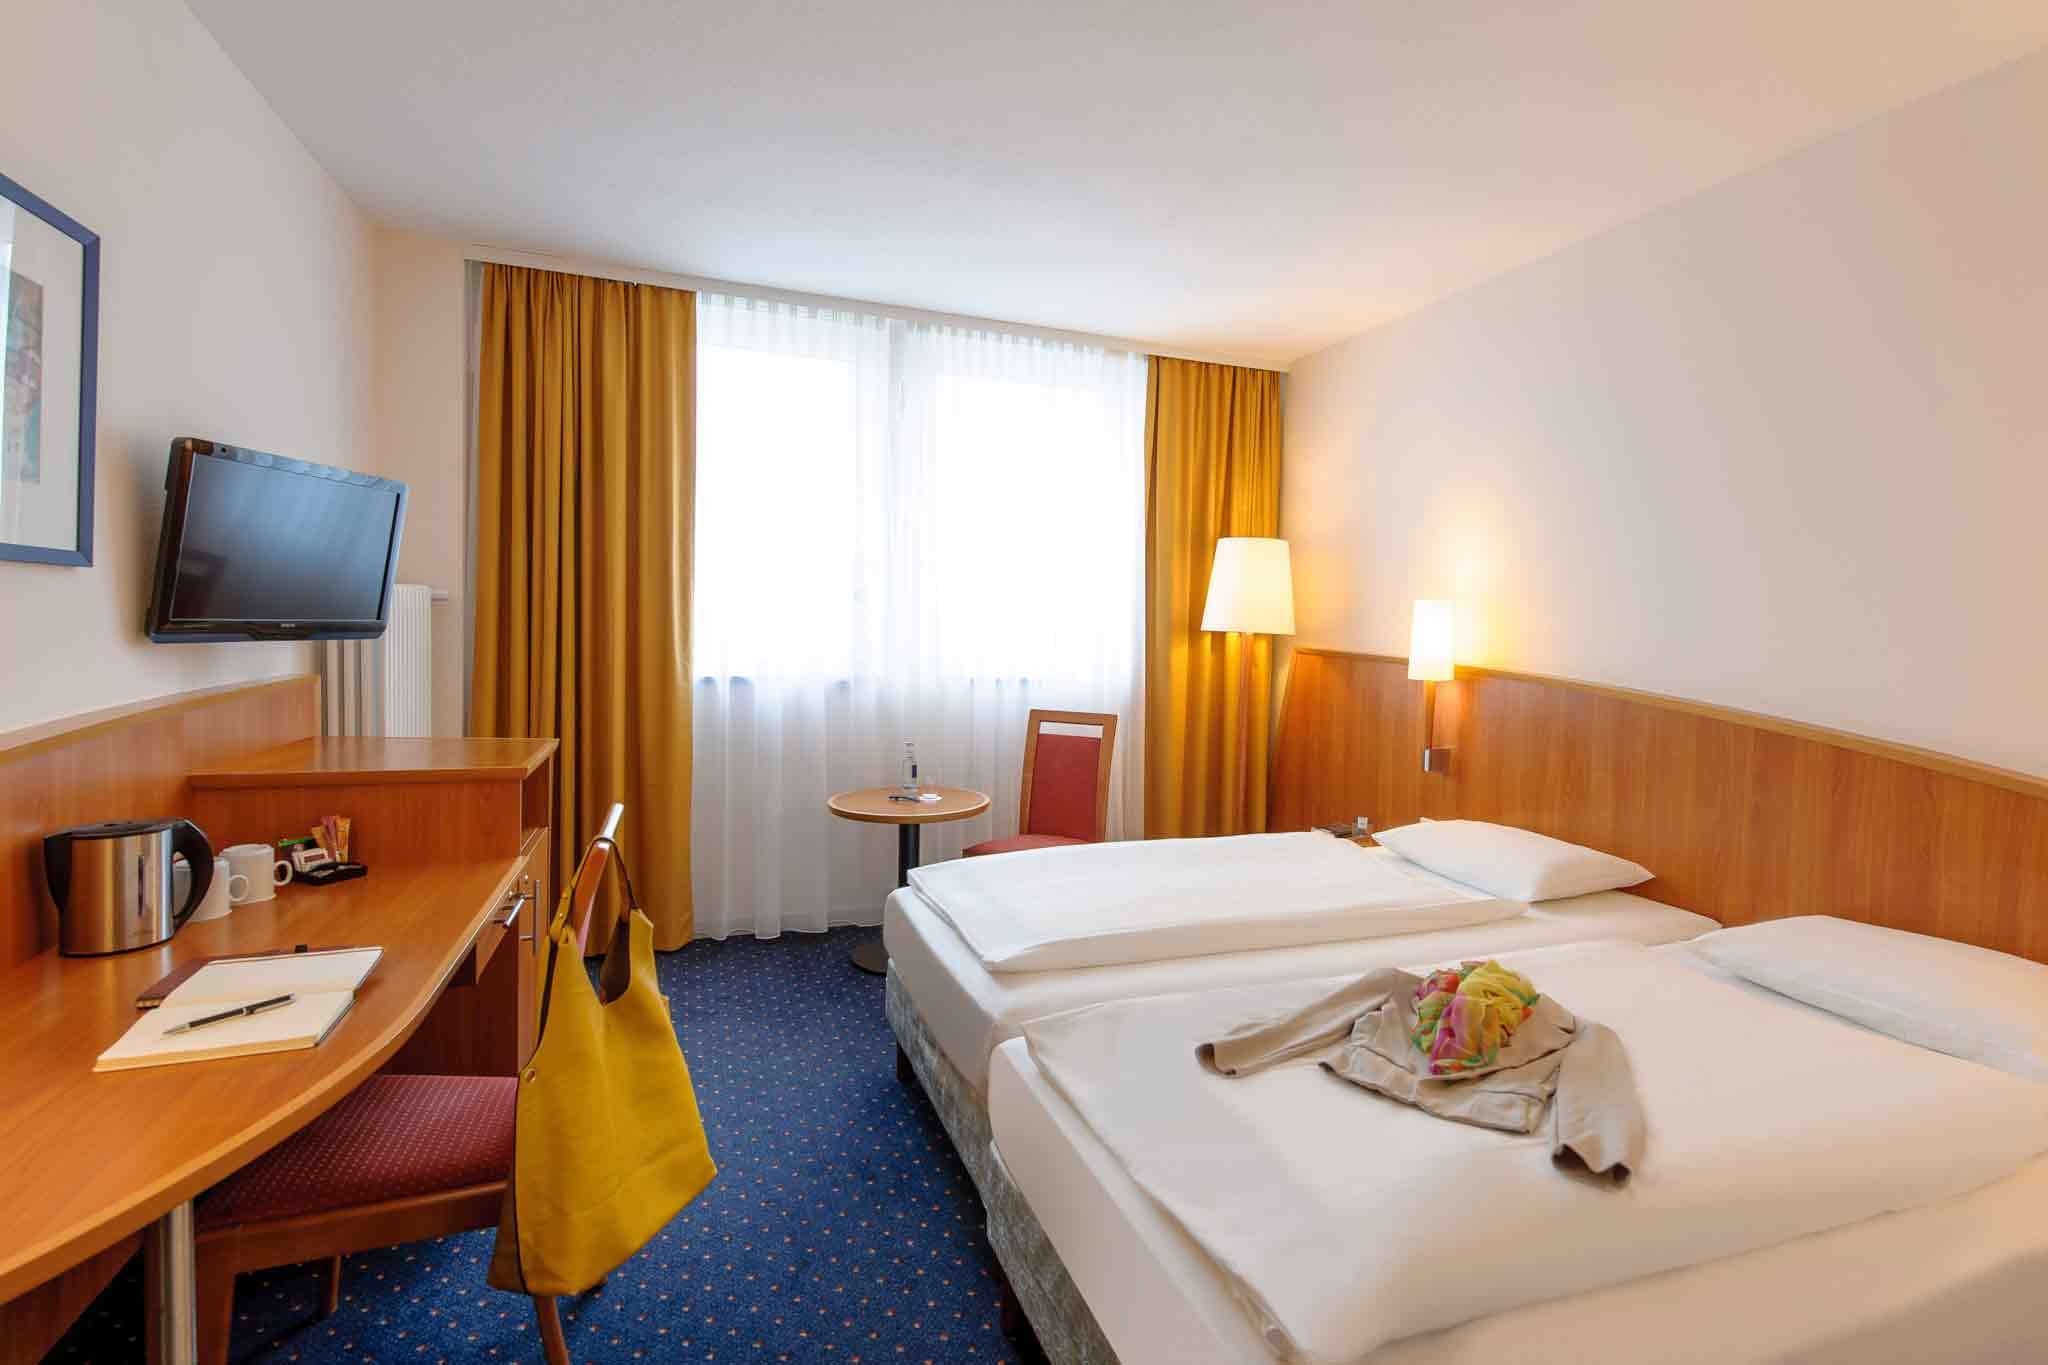 Wöhrdersee Hotel Mercure Nürnberg City Zimmeransicht